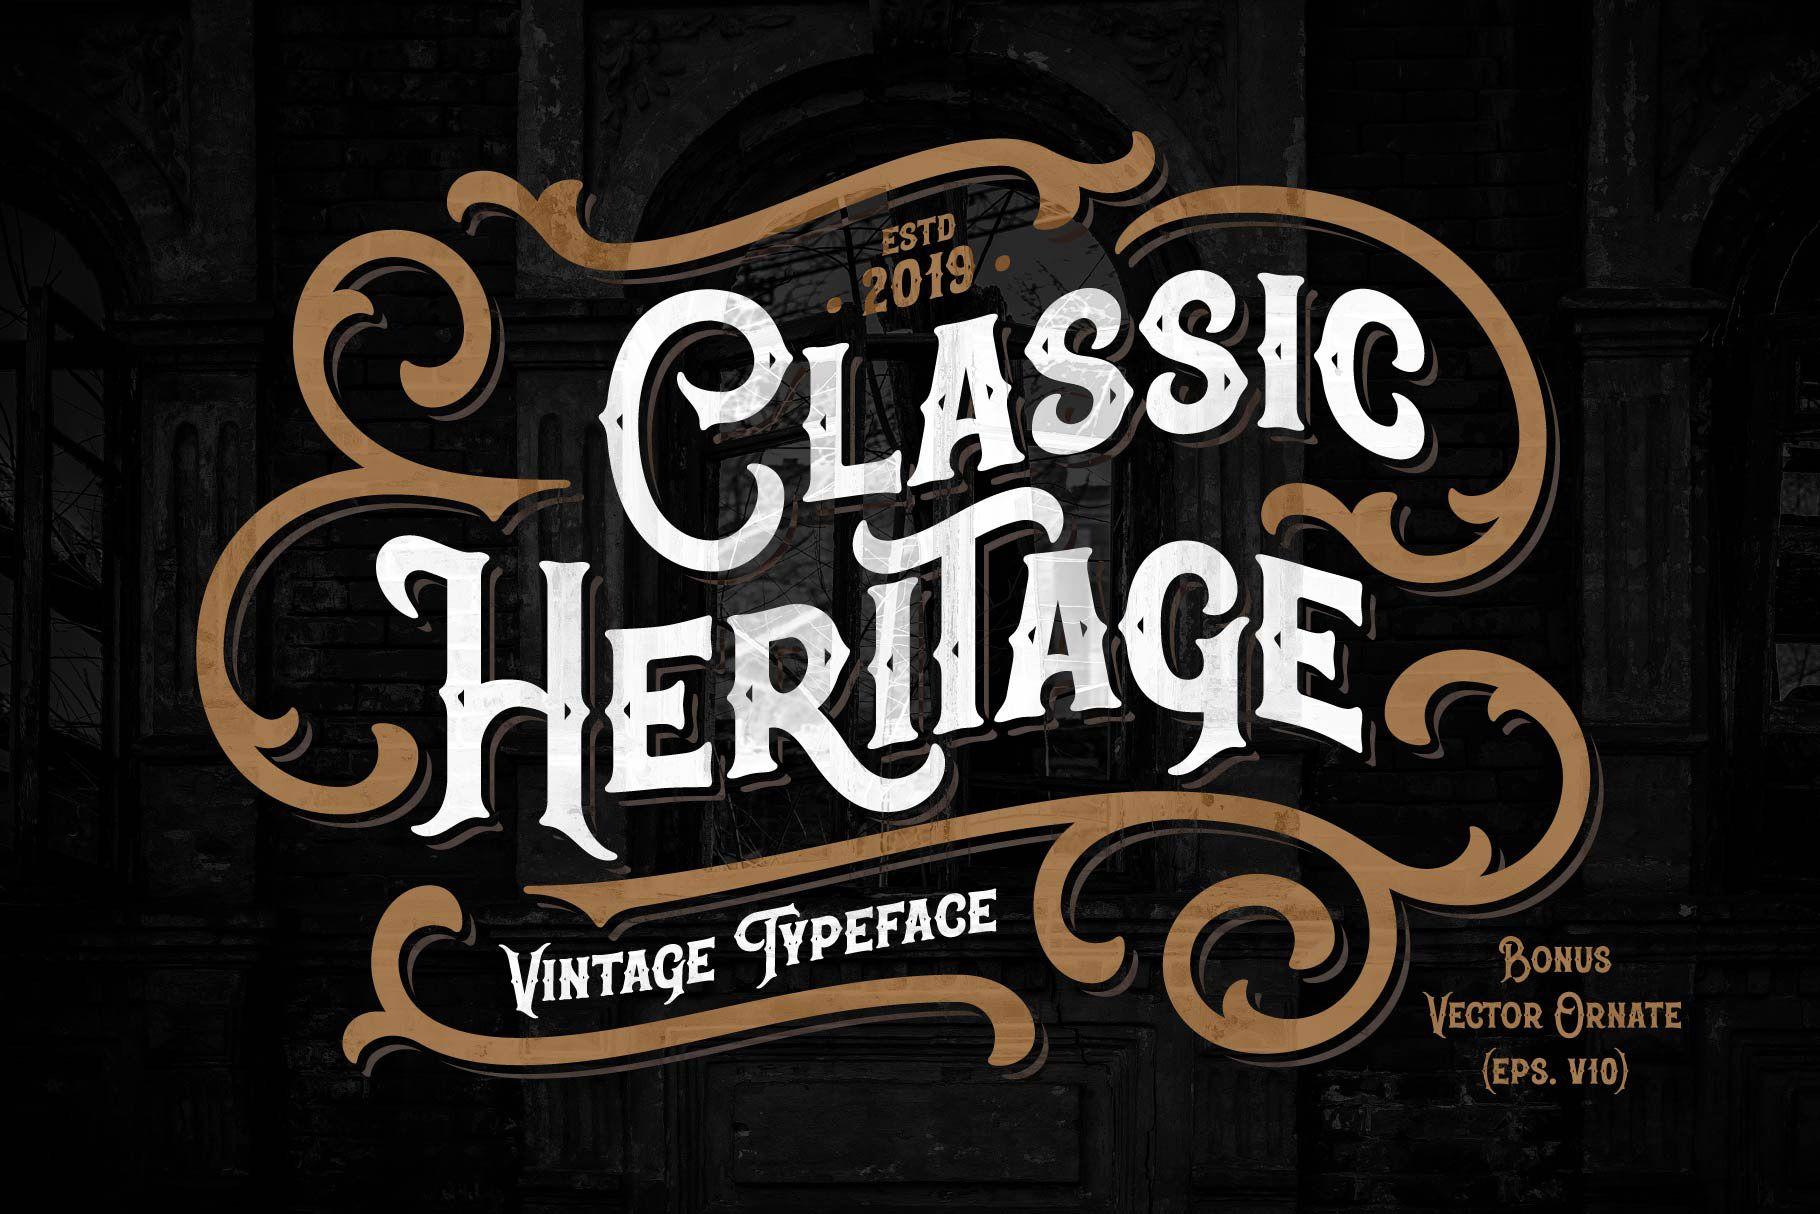 Classic Heritage Typeface 200989 Regular Font Bundles Best Free Script Fonts Typeface Free Script Fonts